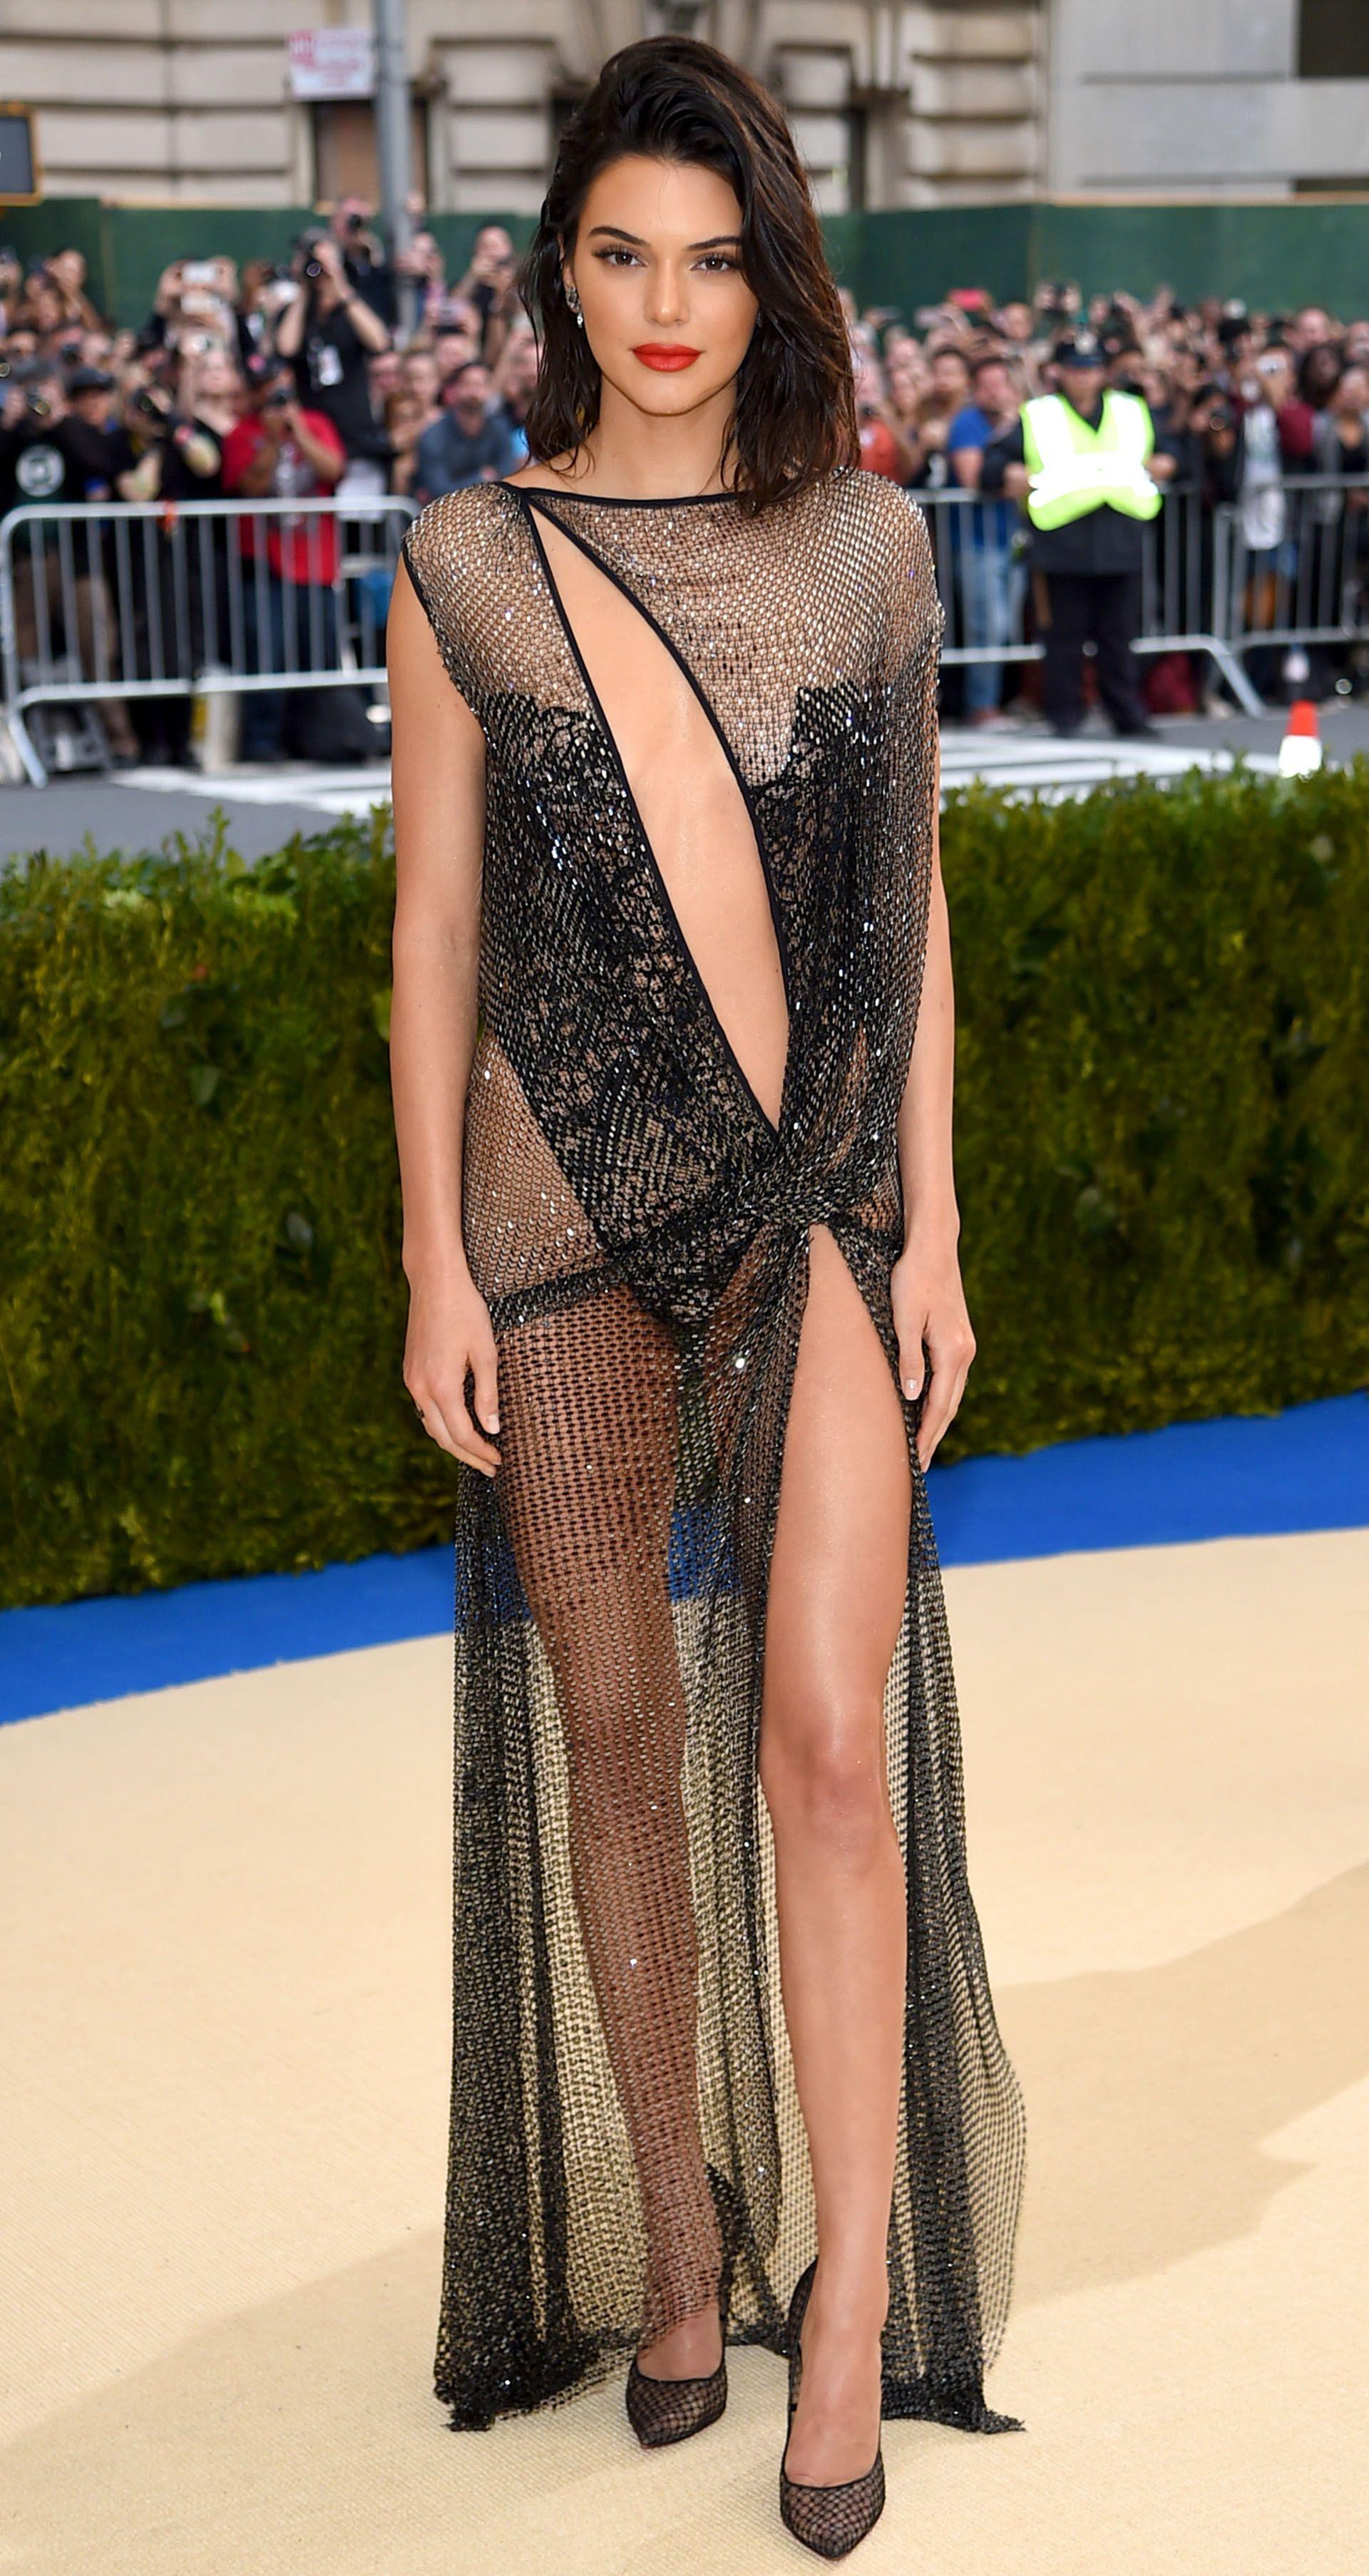 Kendall Jenner Looks Sensational in La Perla's New Campaign picture